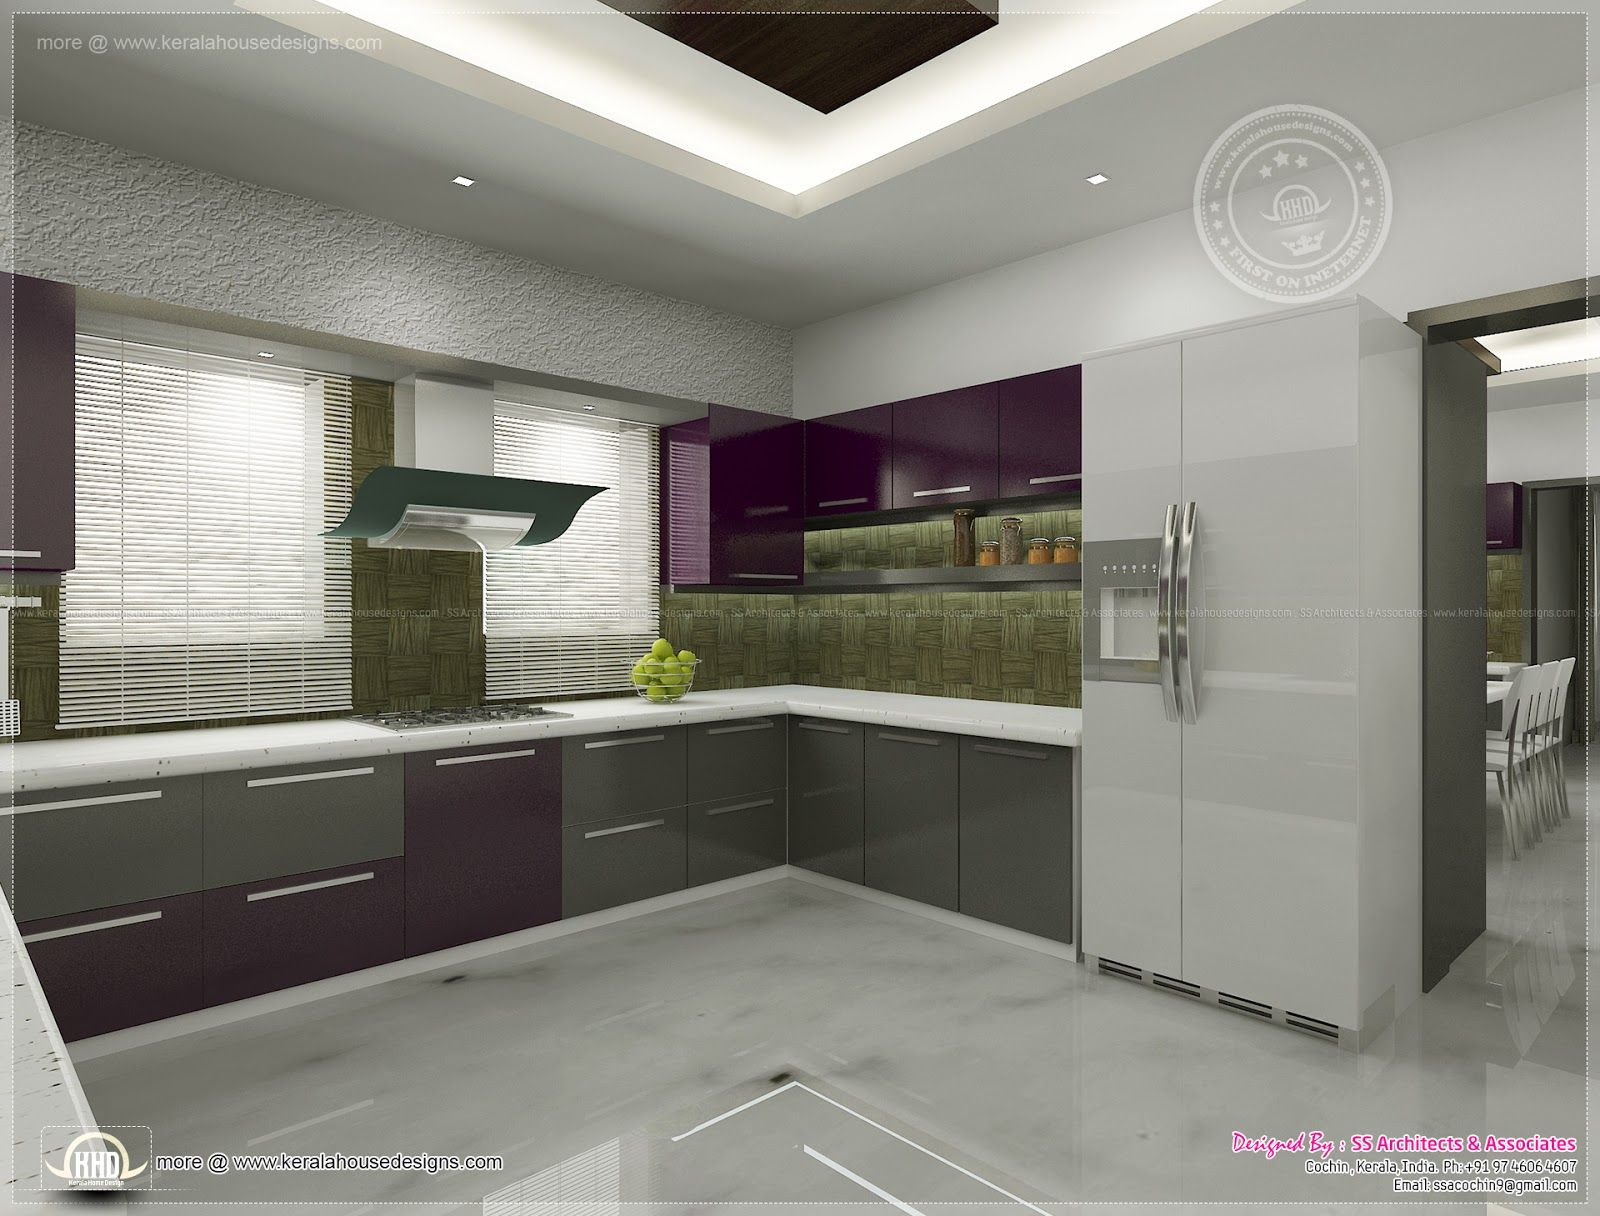 Indian kitchen interior design photos - Kitchen Interior Views Ss Architects Cochin Kerala Home Design Home Kitchen Design India